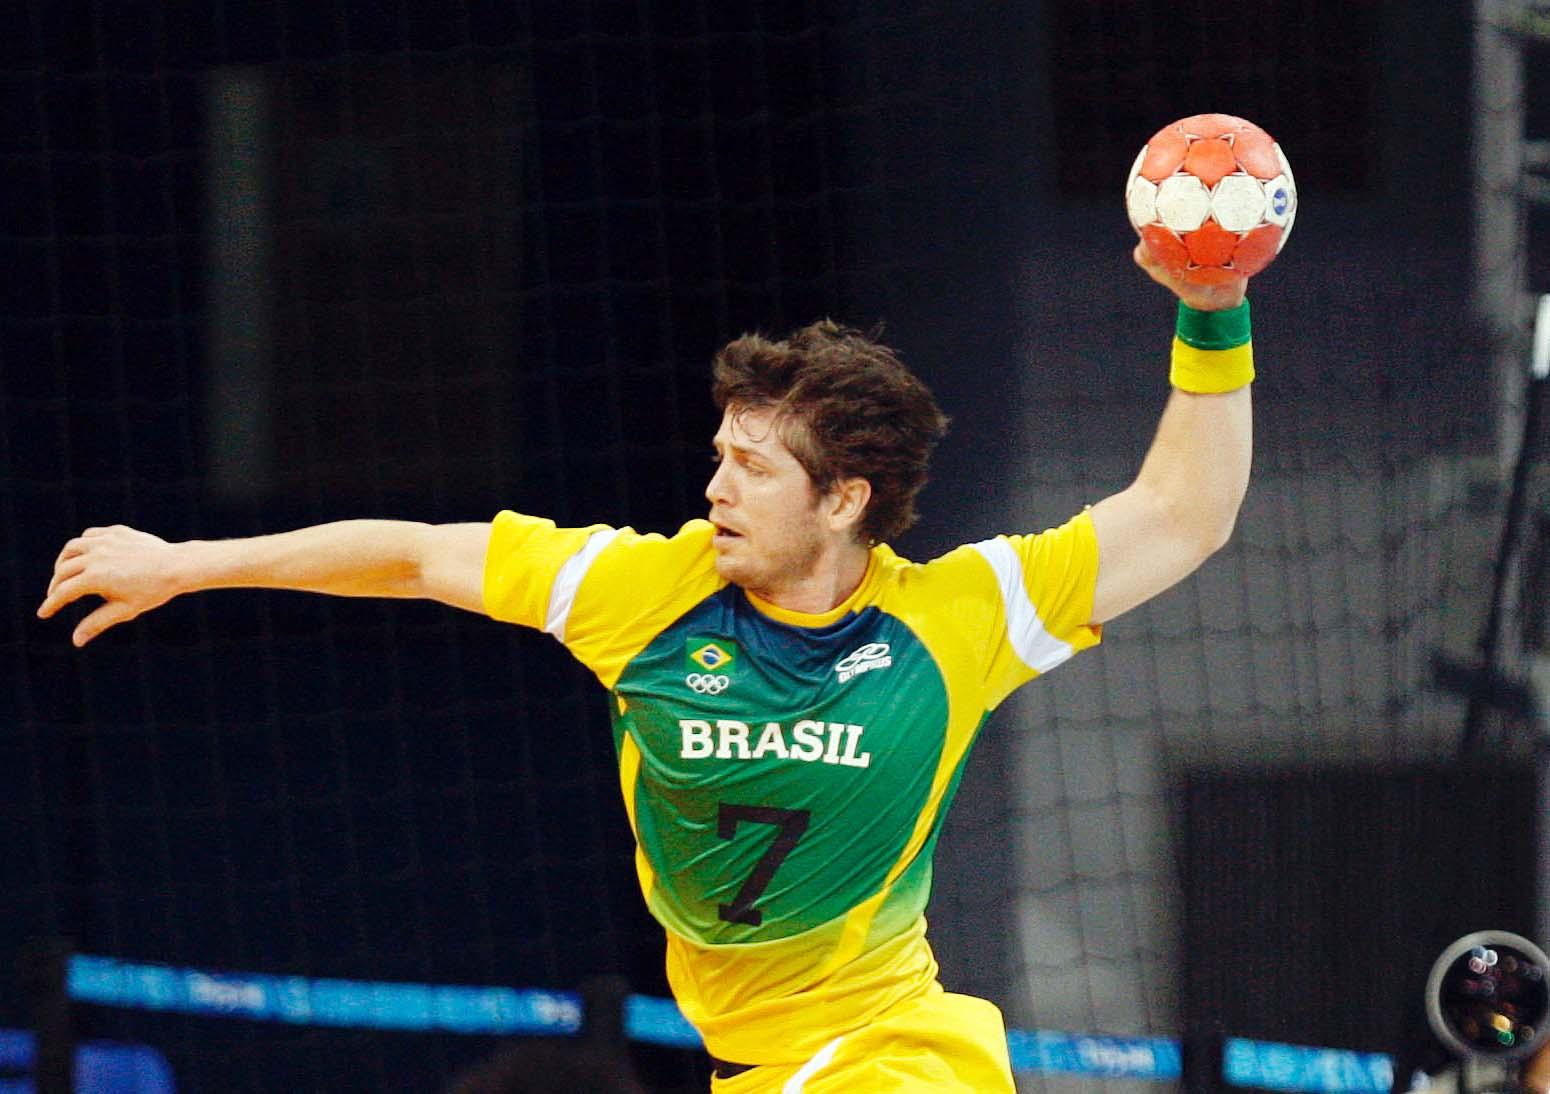 handebol brasil: